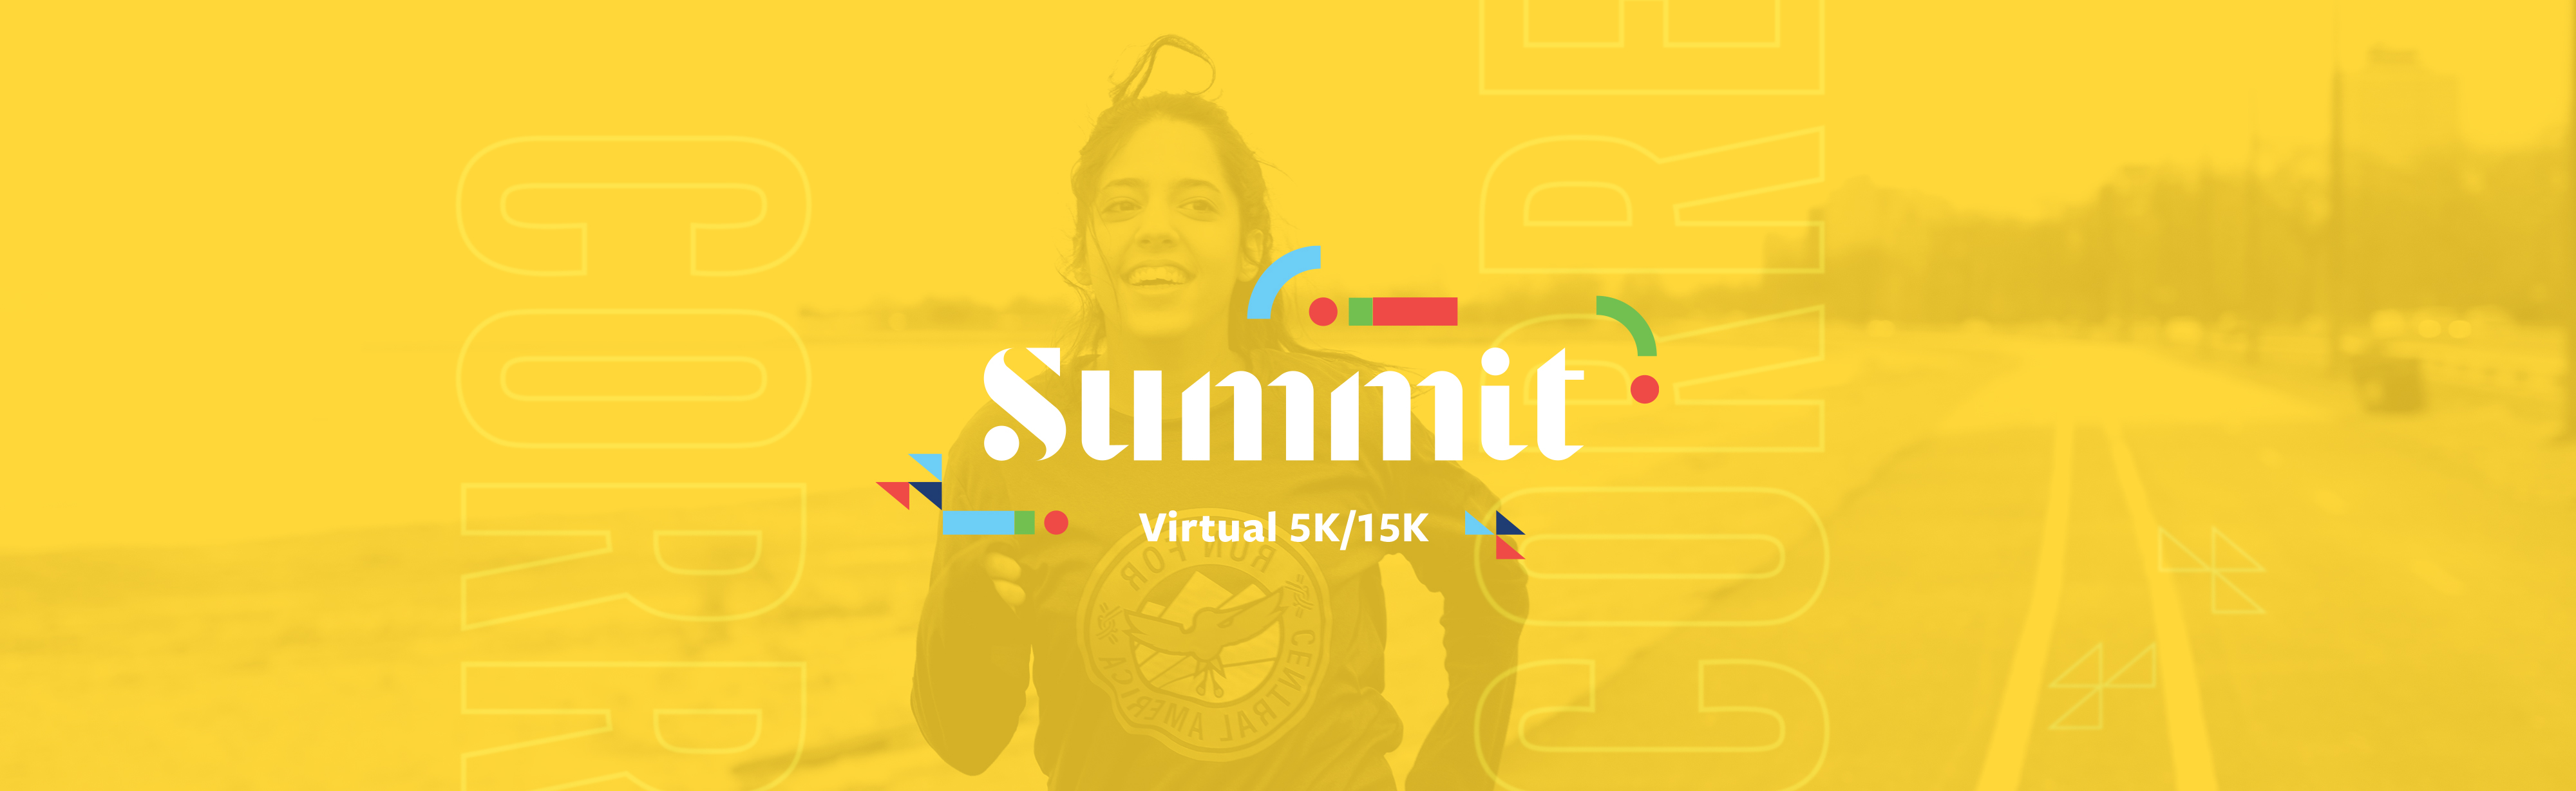 Summit Virtual 5K/15K